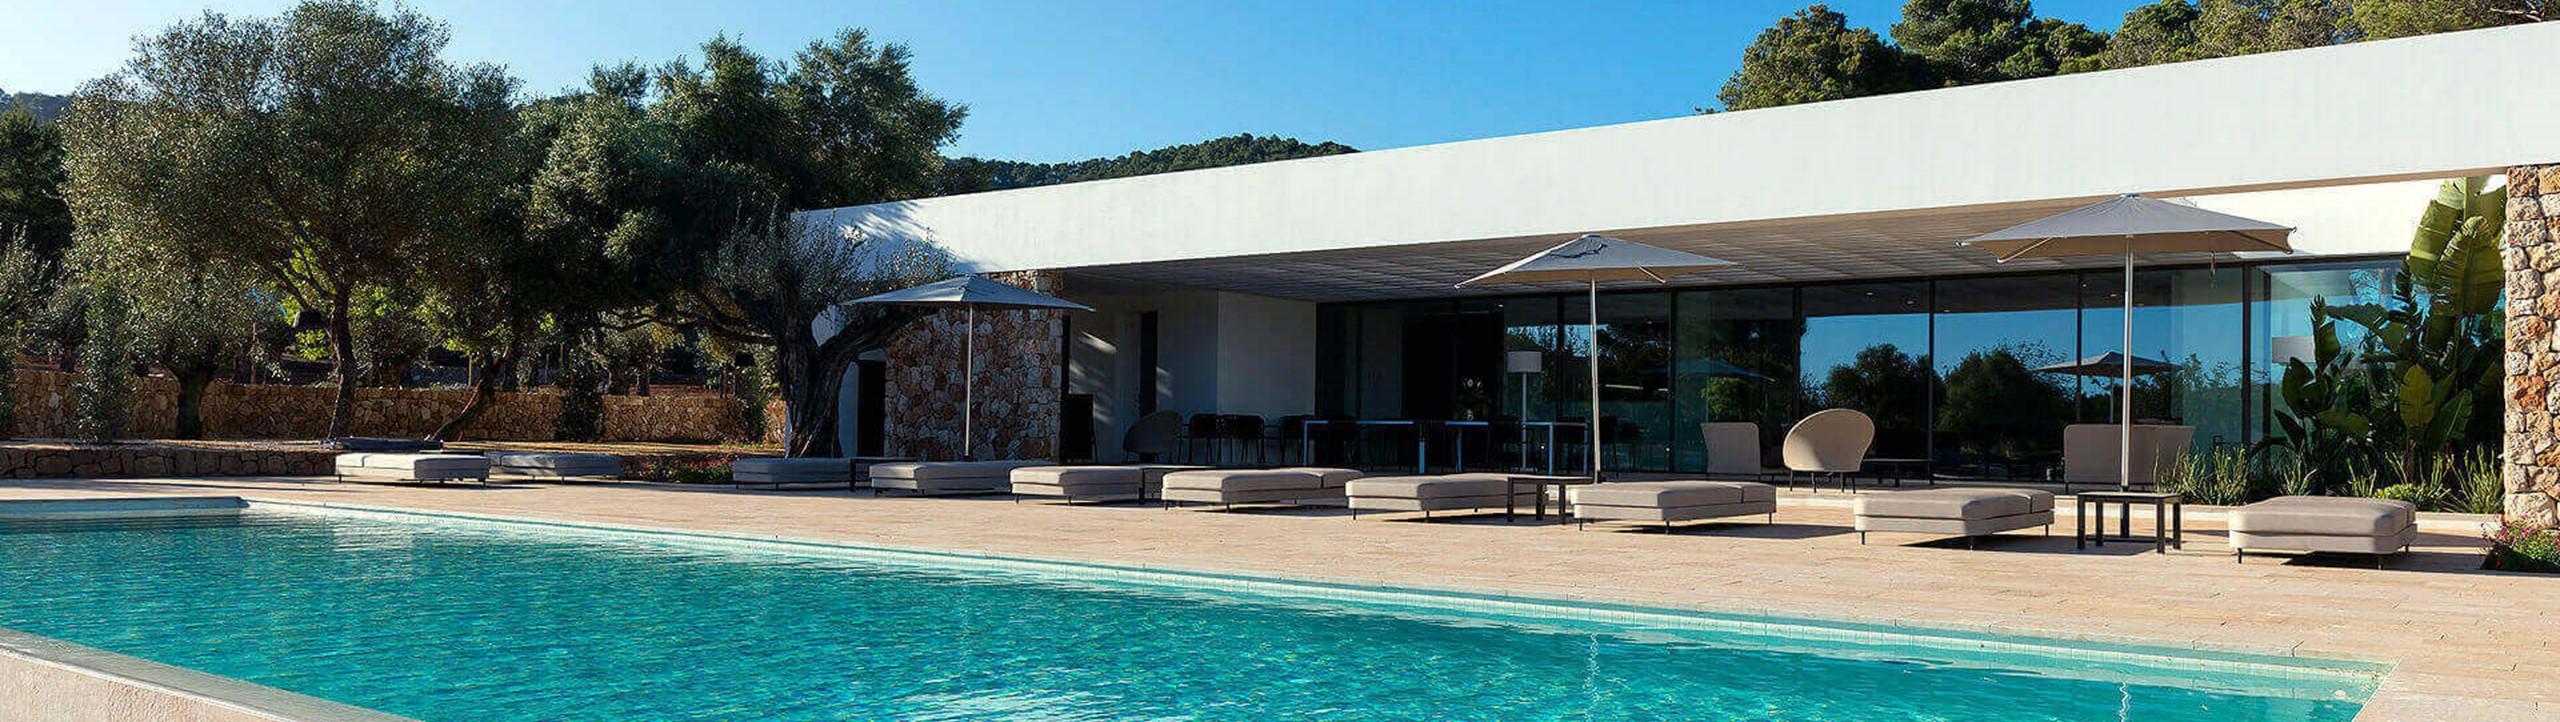 Villa Calma Ibiza 2 Near Santa Eulalia